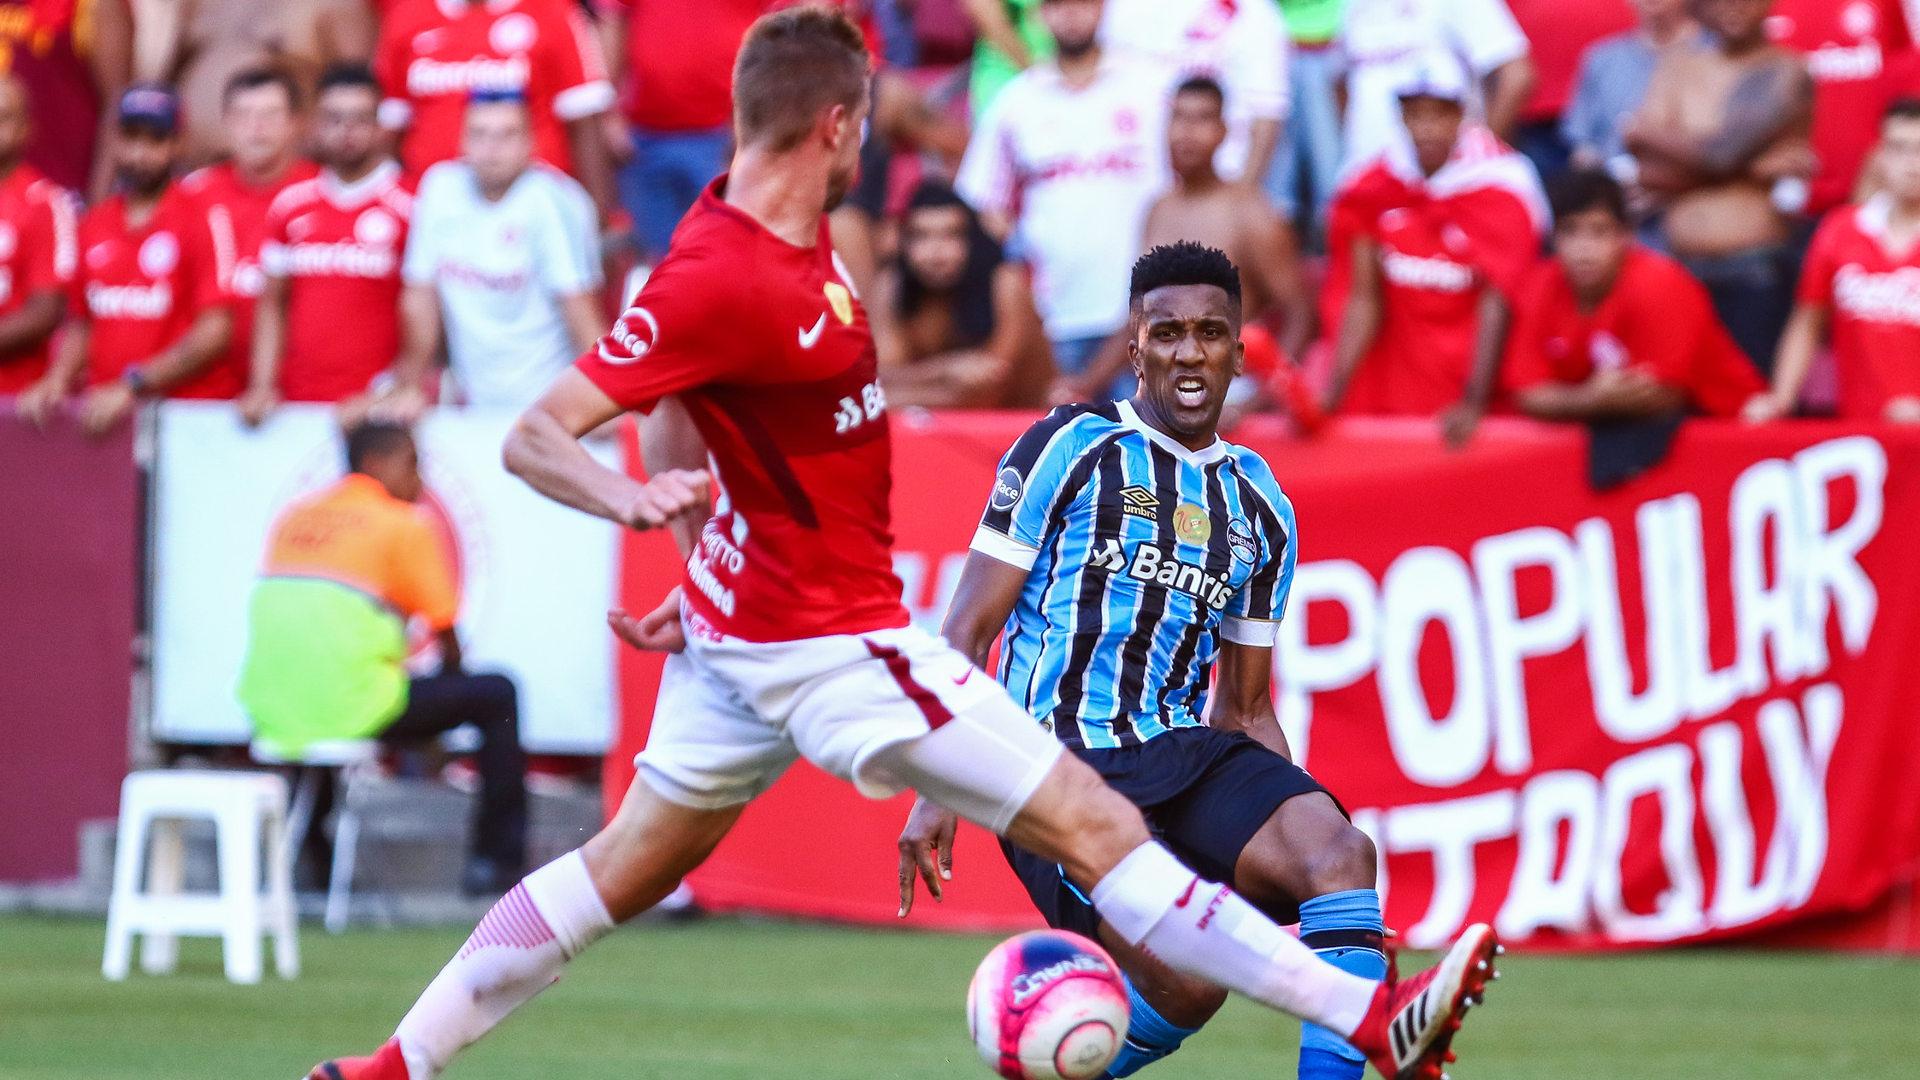 Cortez Internacional Gremio 11032018 Gaucho (Foto  Lucas Uebel Grêmio  Divulgação) ae37b06949ddd